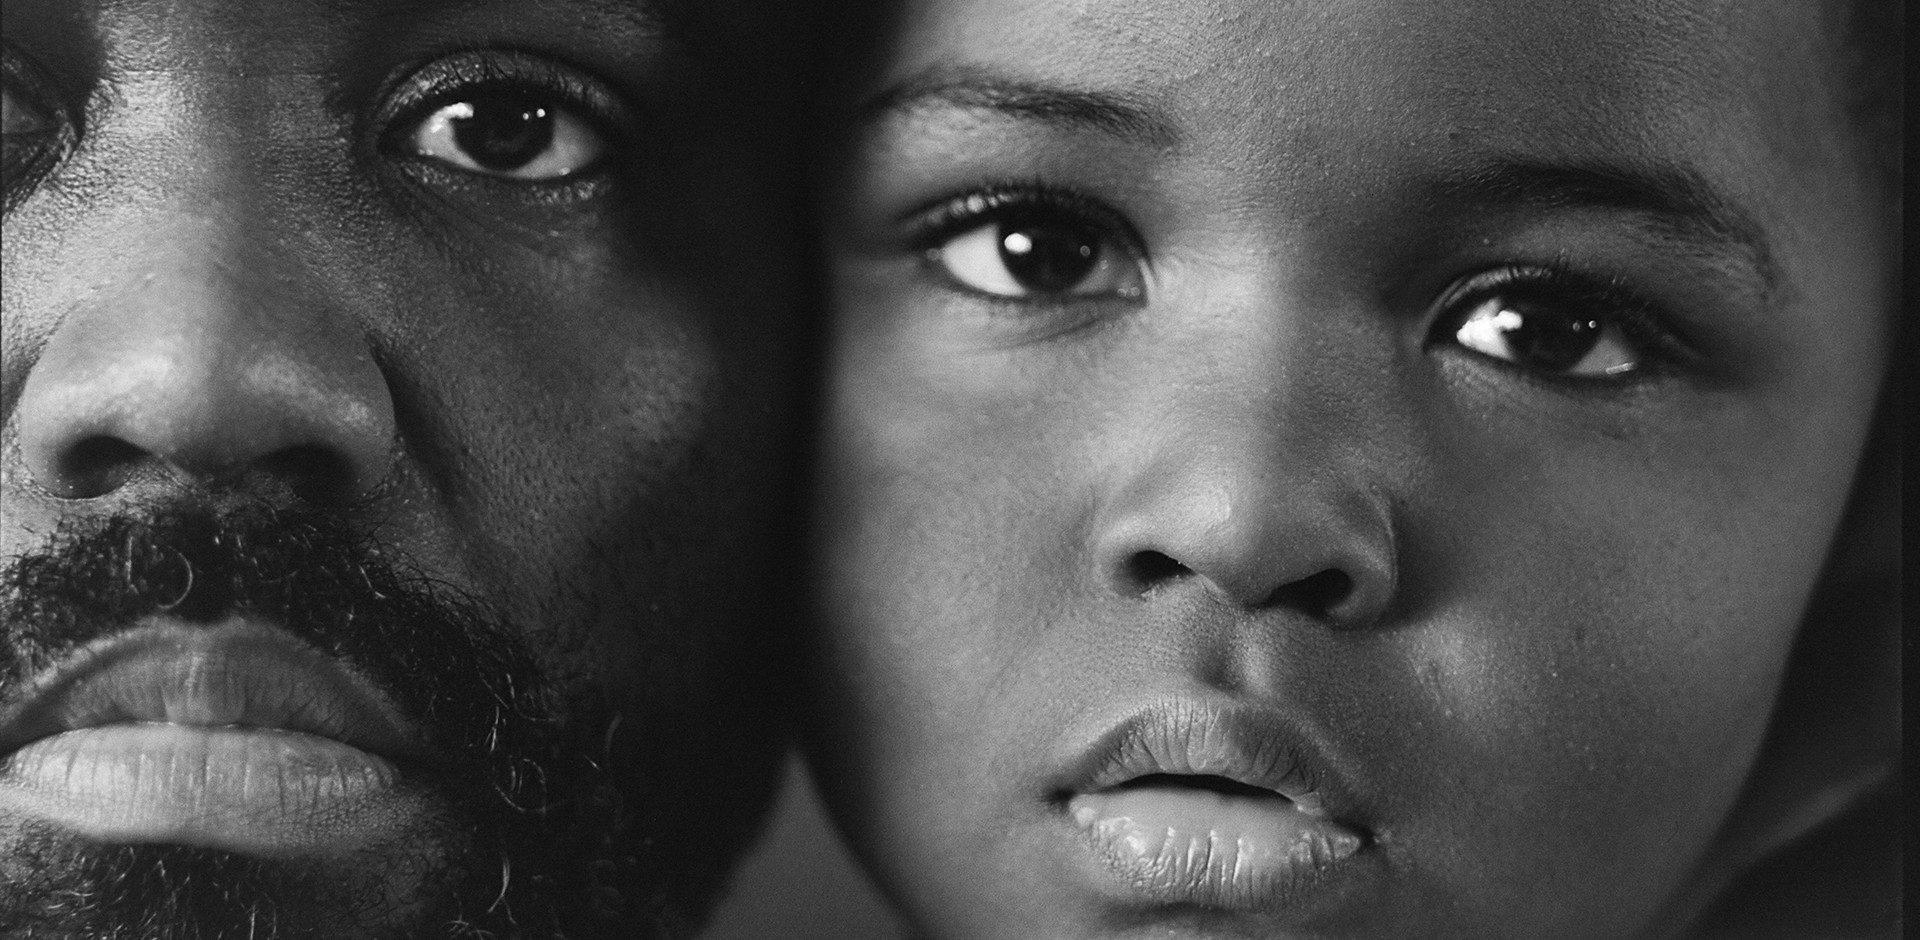 Self-portrait of Rashod Taylor and his son L. J.